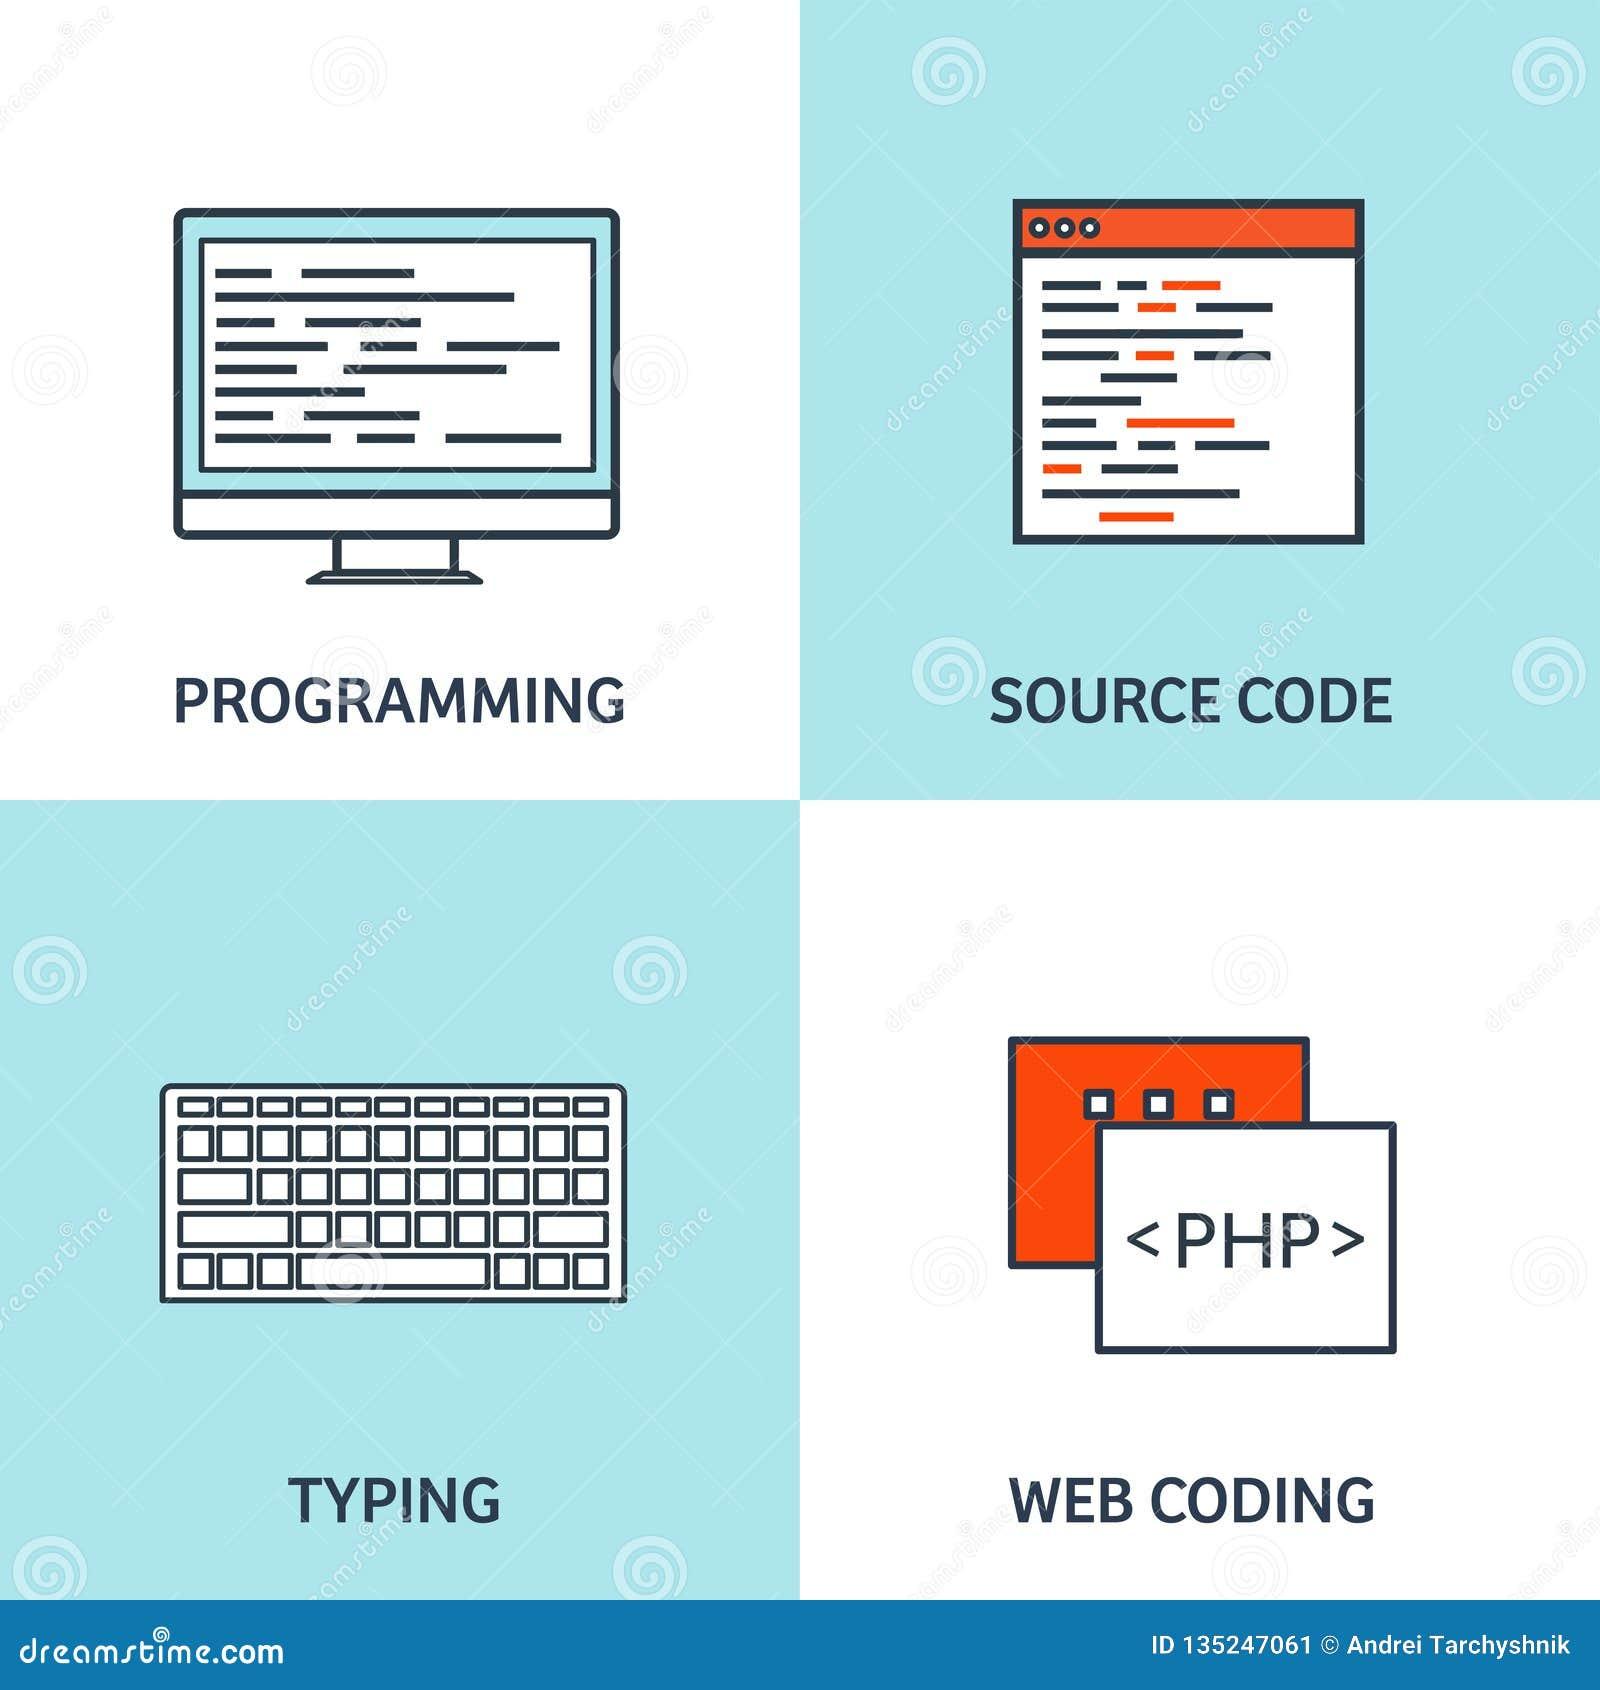 Vector illustration. Flat background. Coding, programming. SEO. Search engine optimization. App development, creation